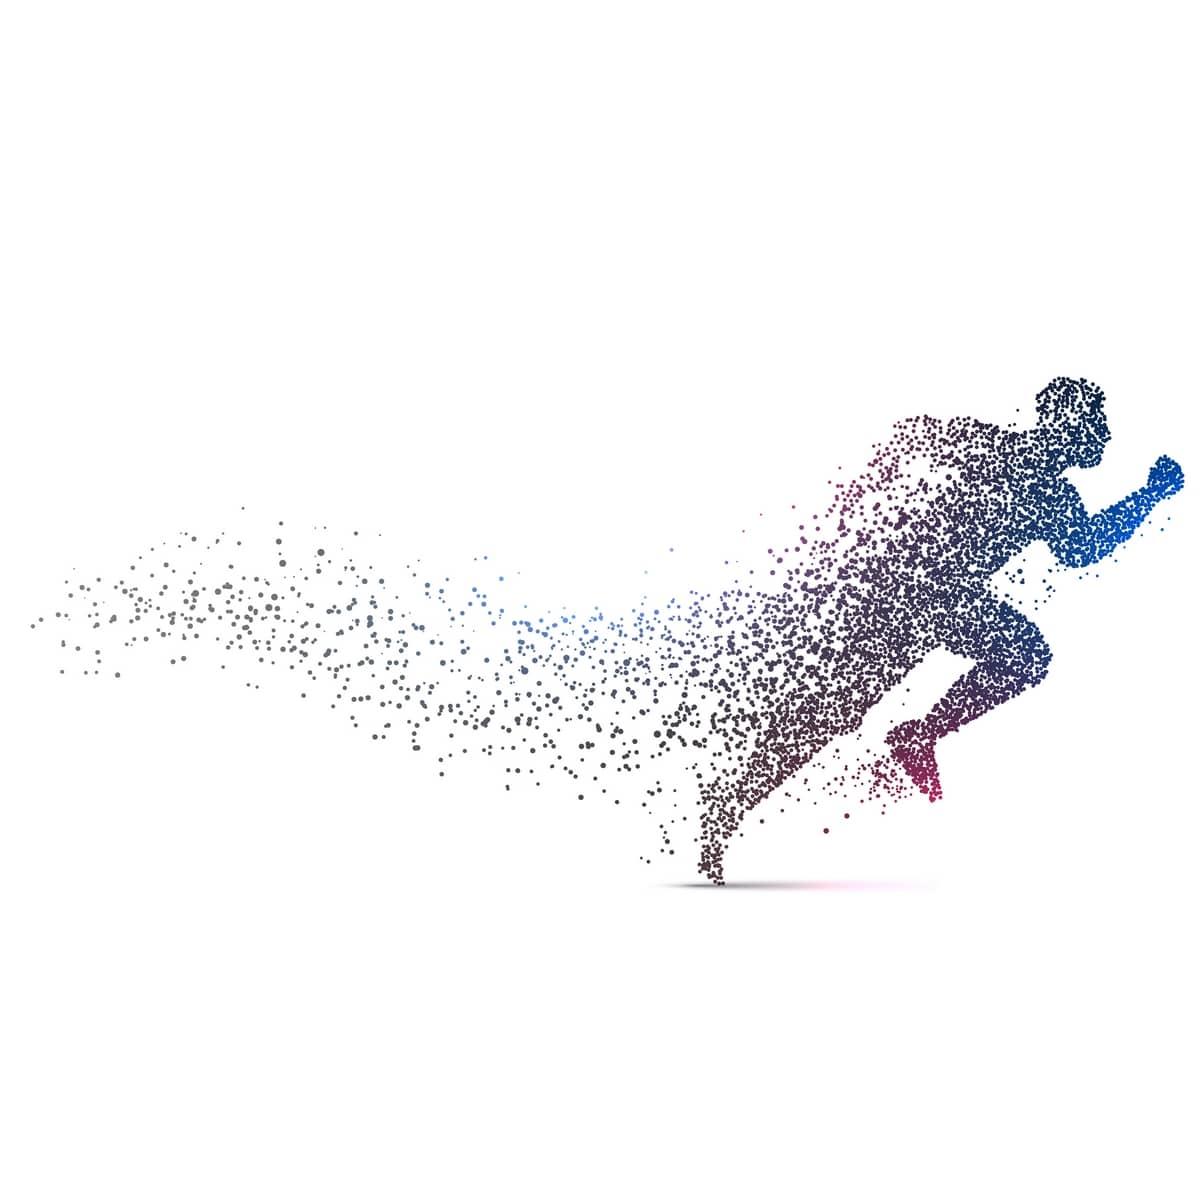 Bėgantis žmogus